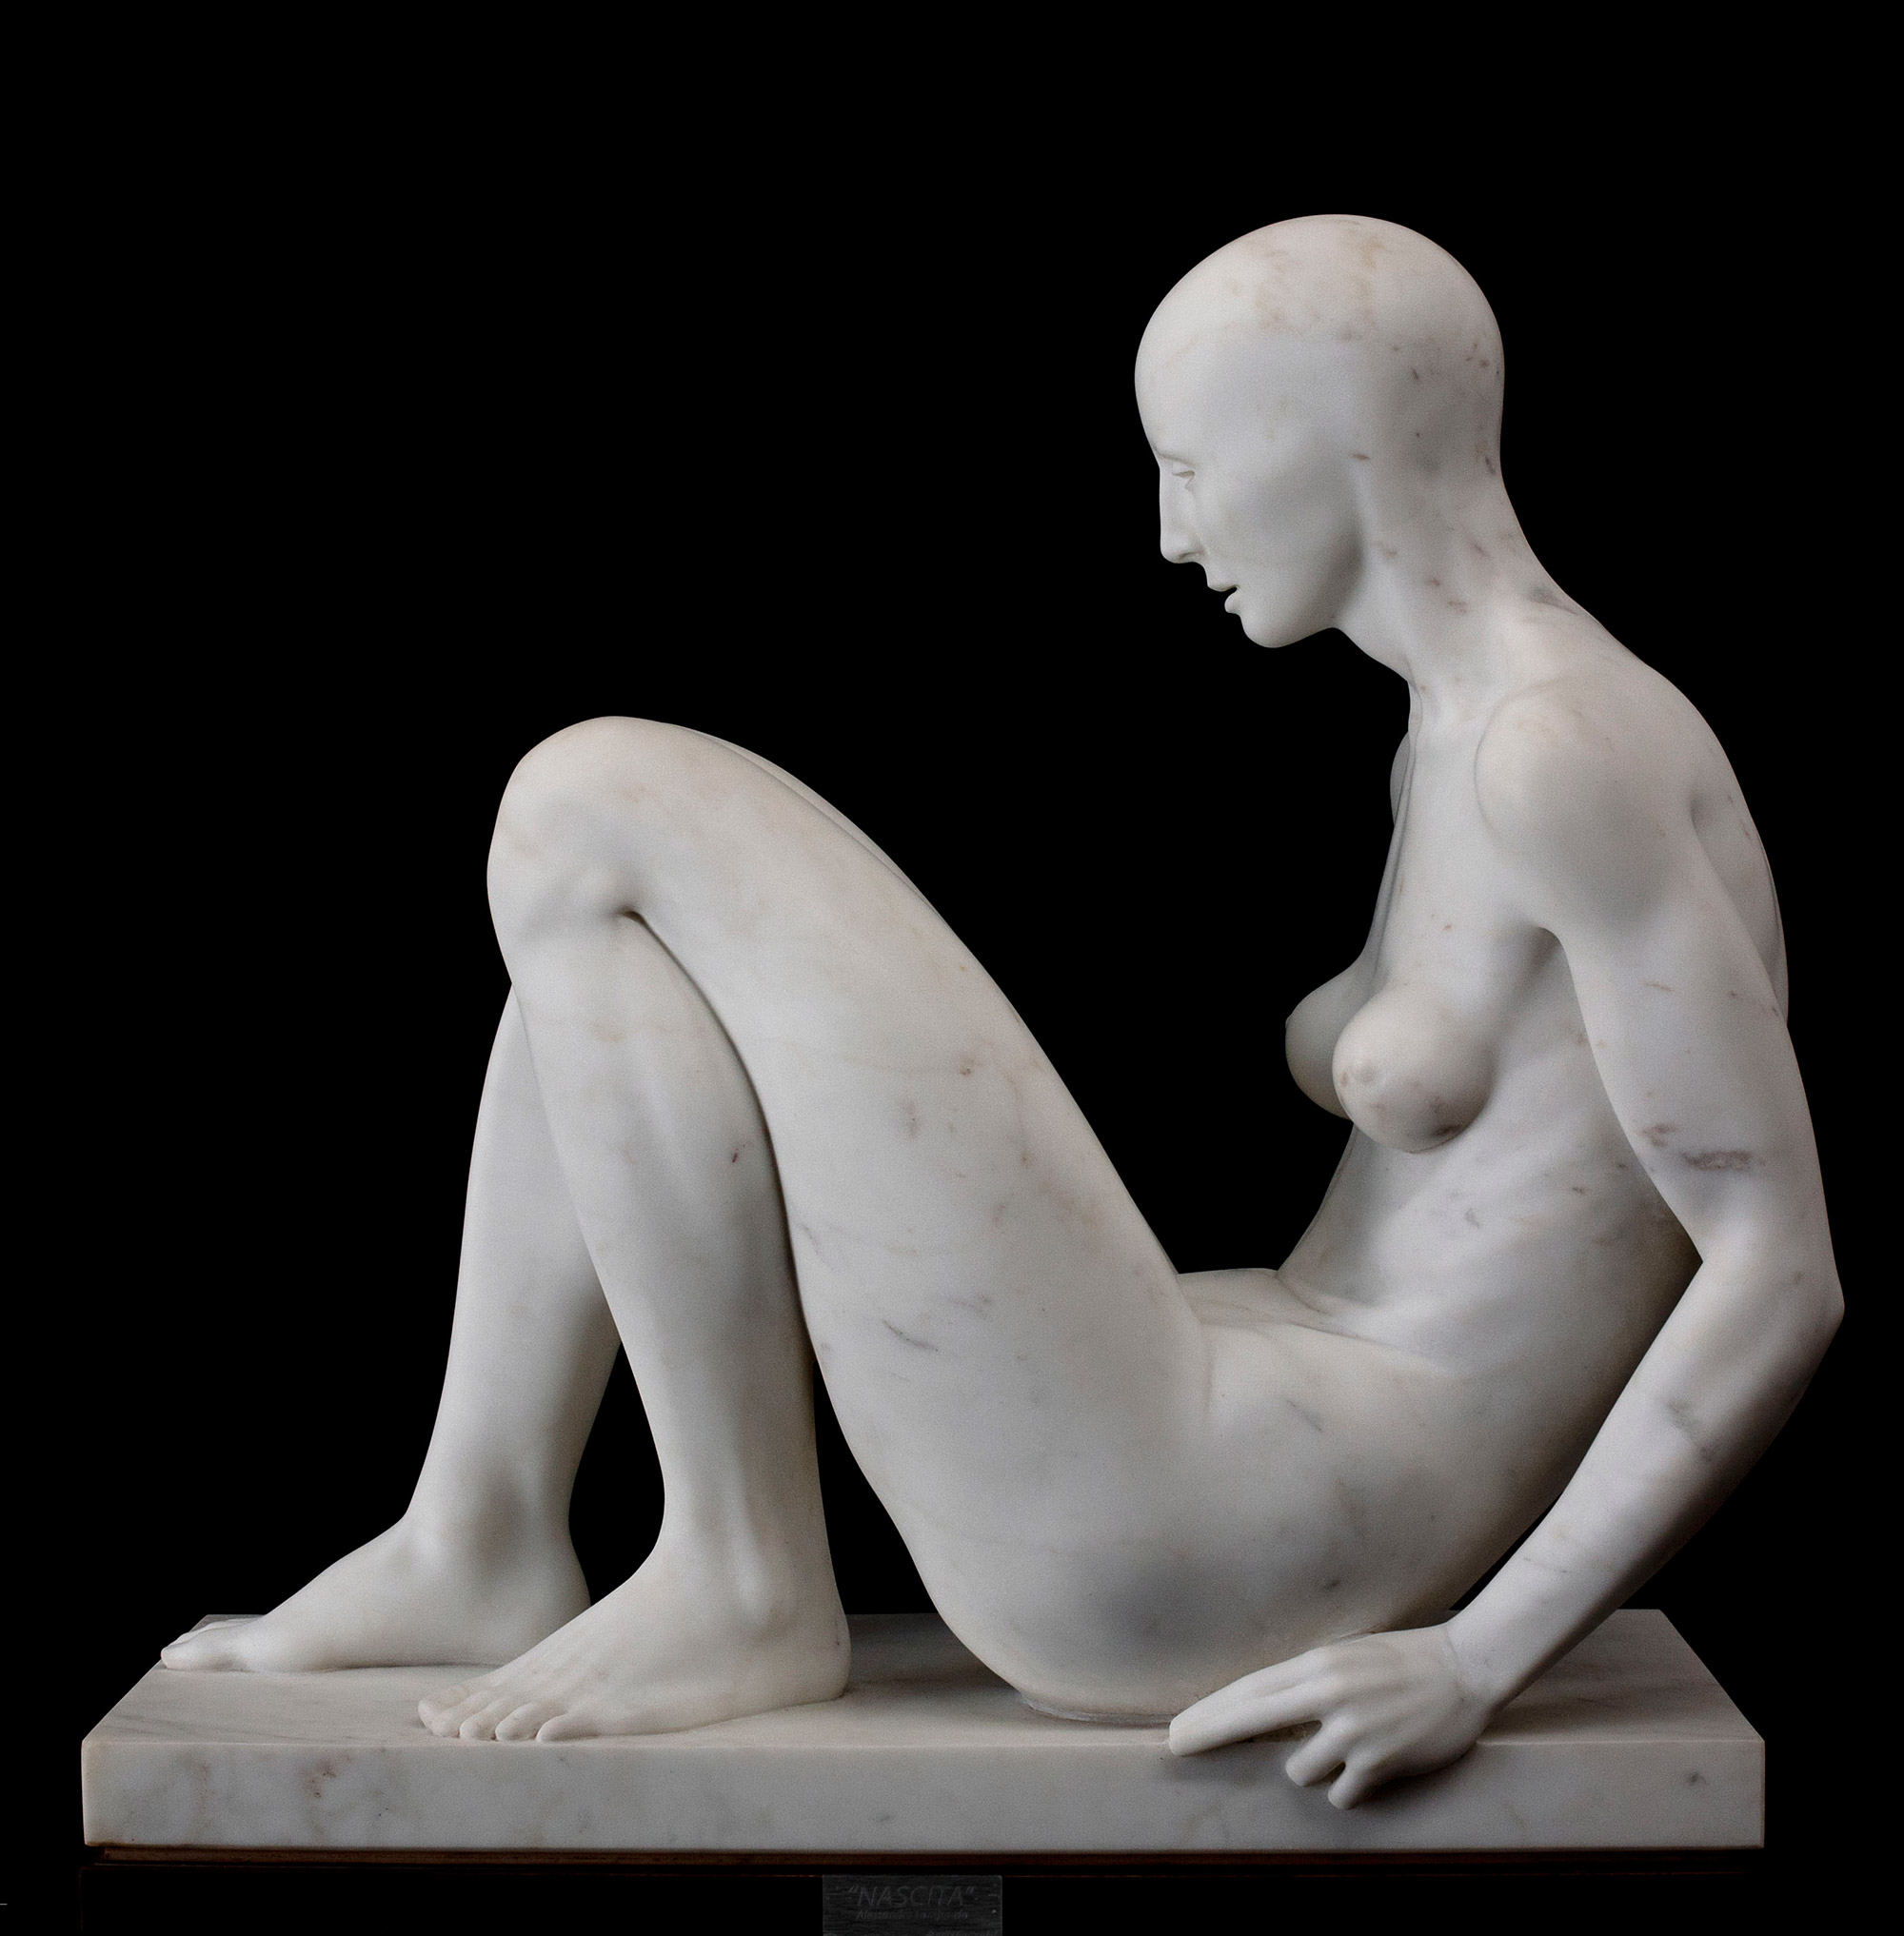 Alessandro-Lombardo-Figurative-Marble-Sculpture-7.jpg